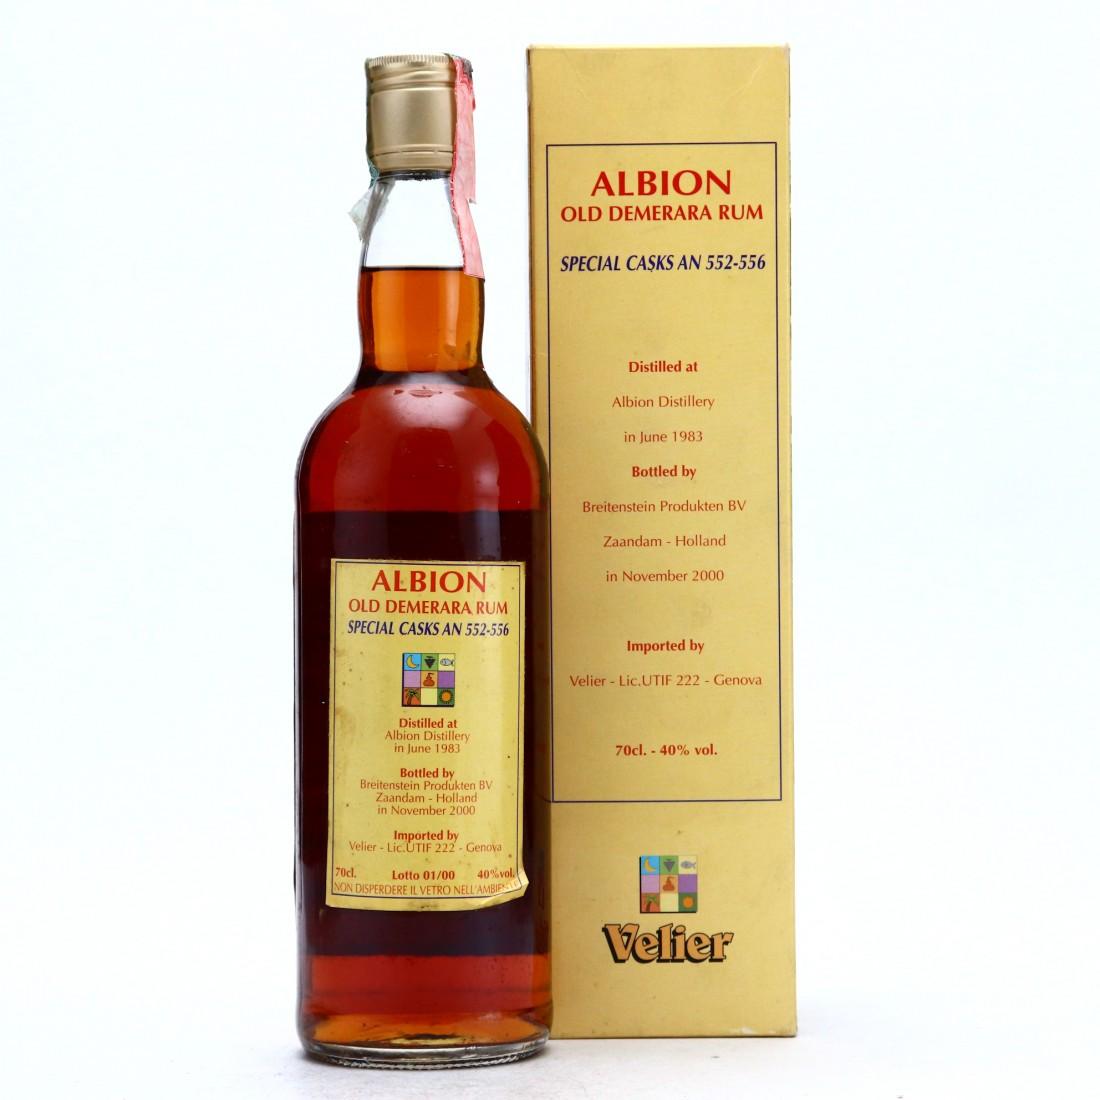 Albion AN 1983 Velier